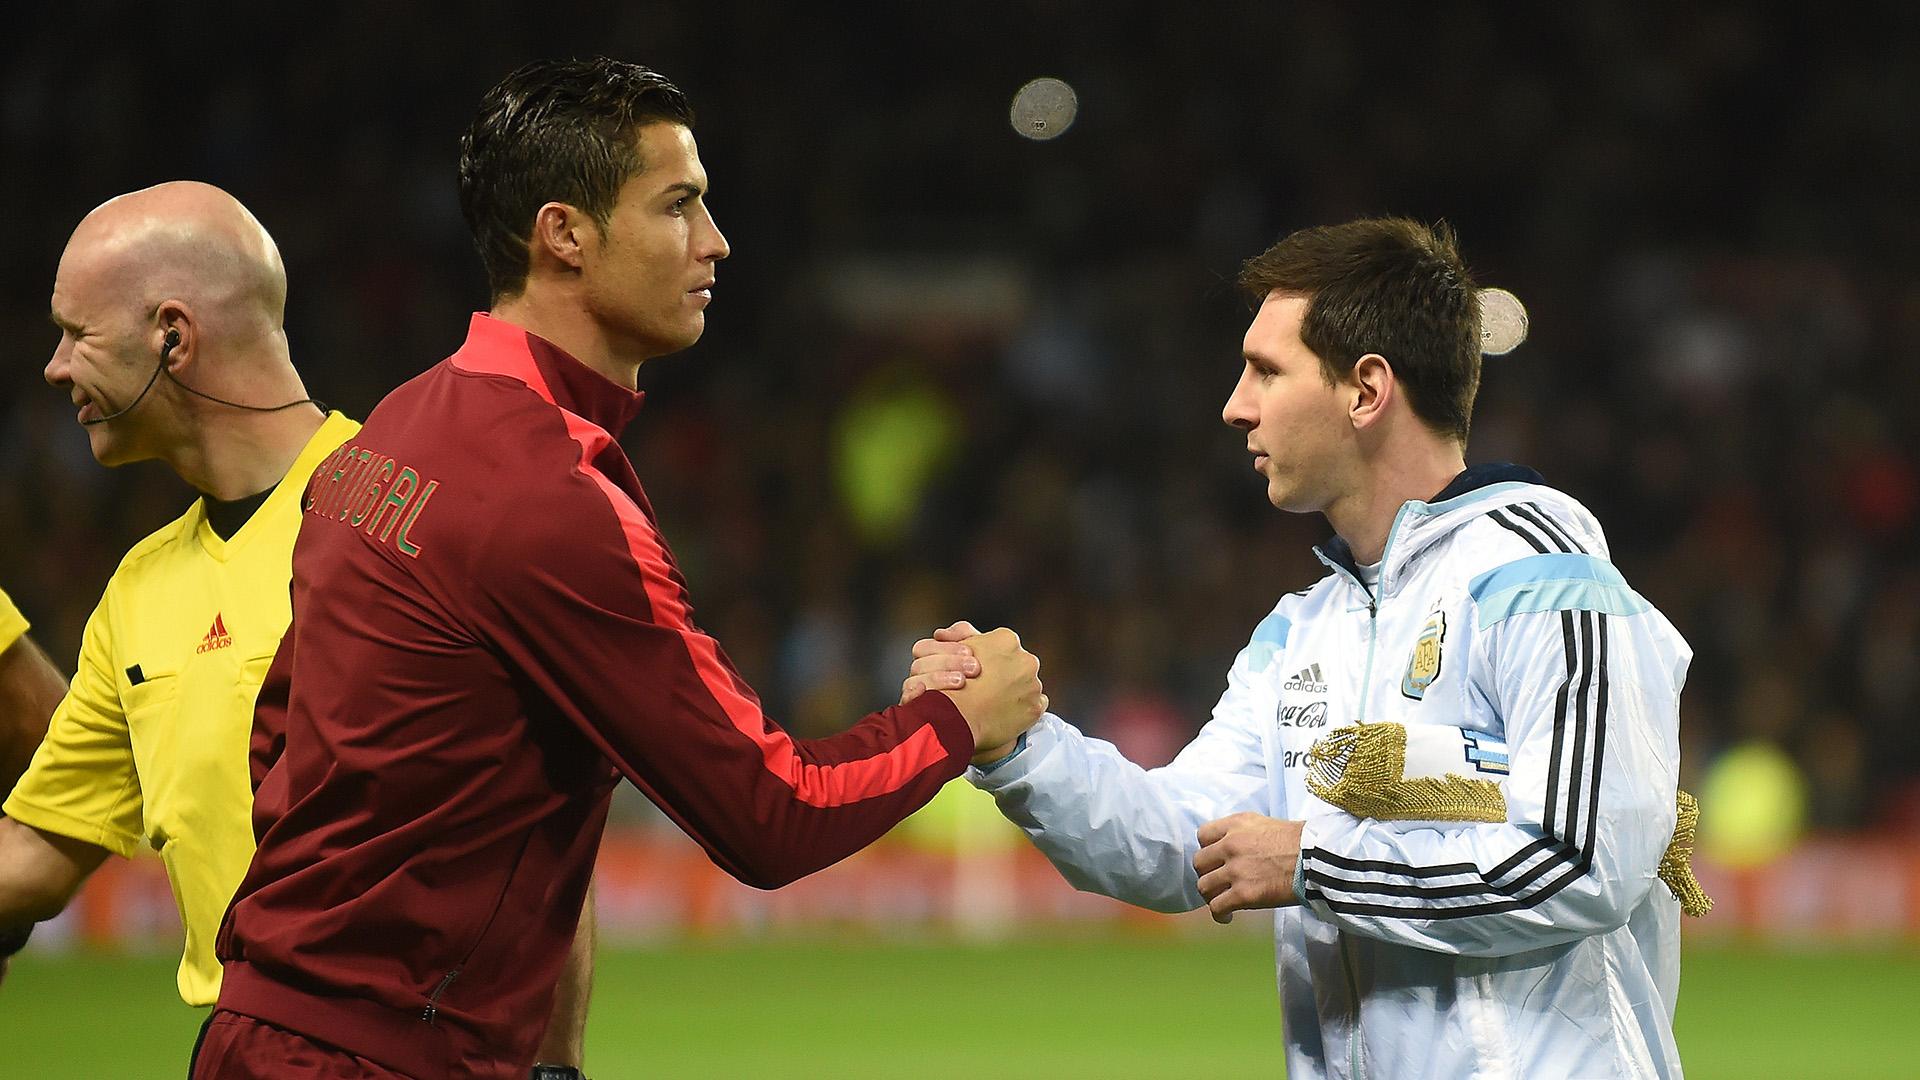 Cristiano Ronaldo vs Lionel Messi - Who has the better stats in major international tournaments?